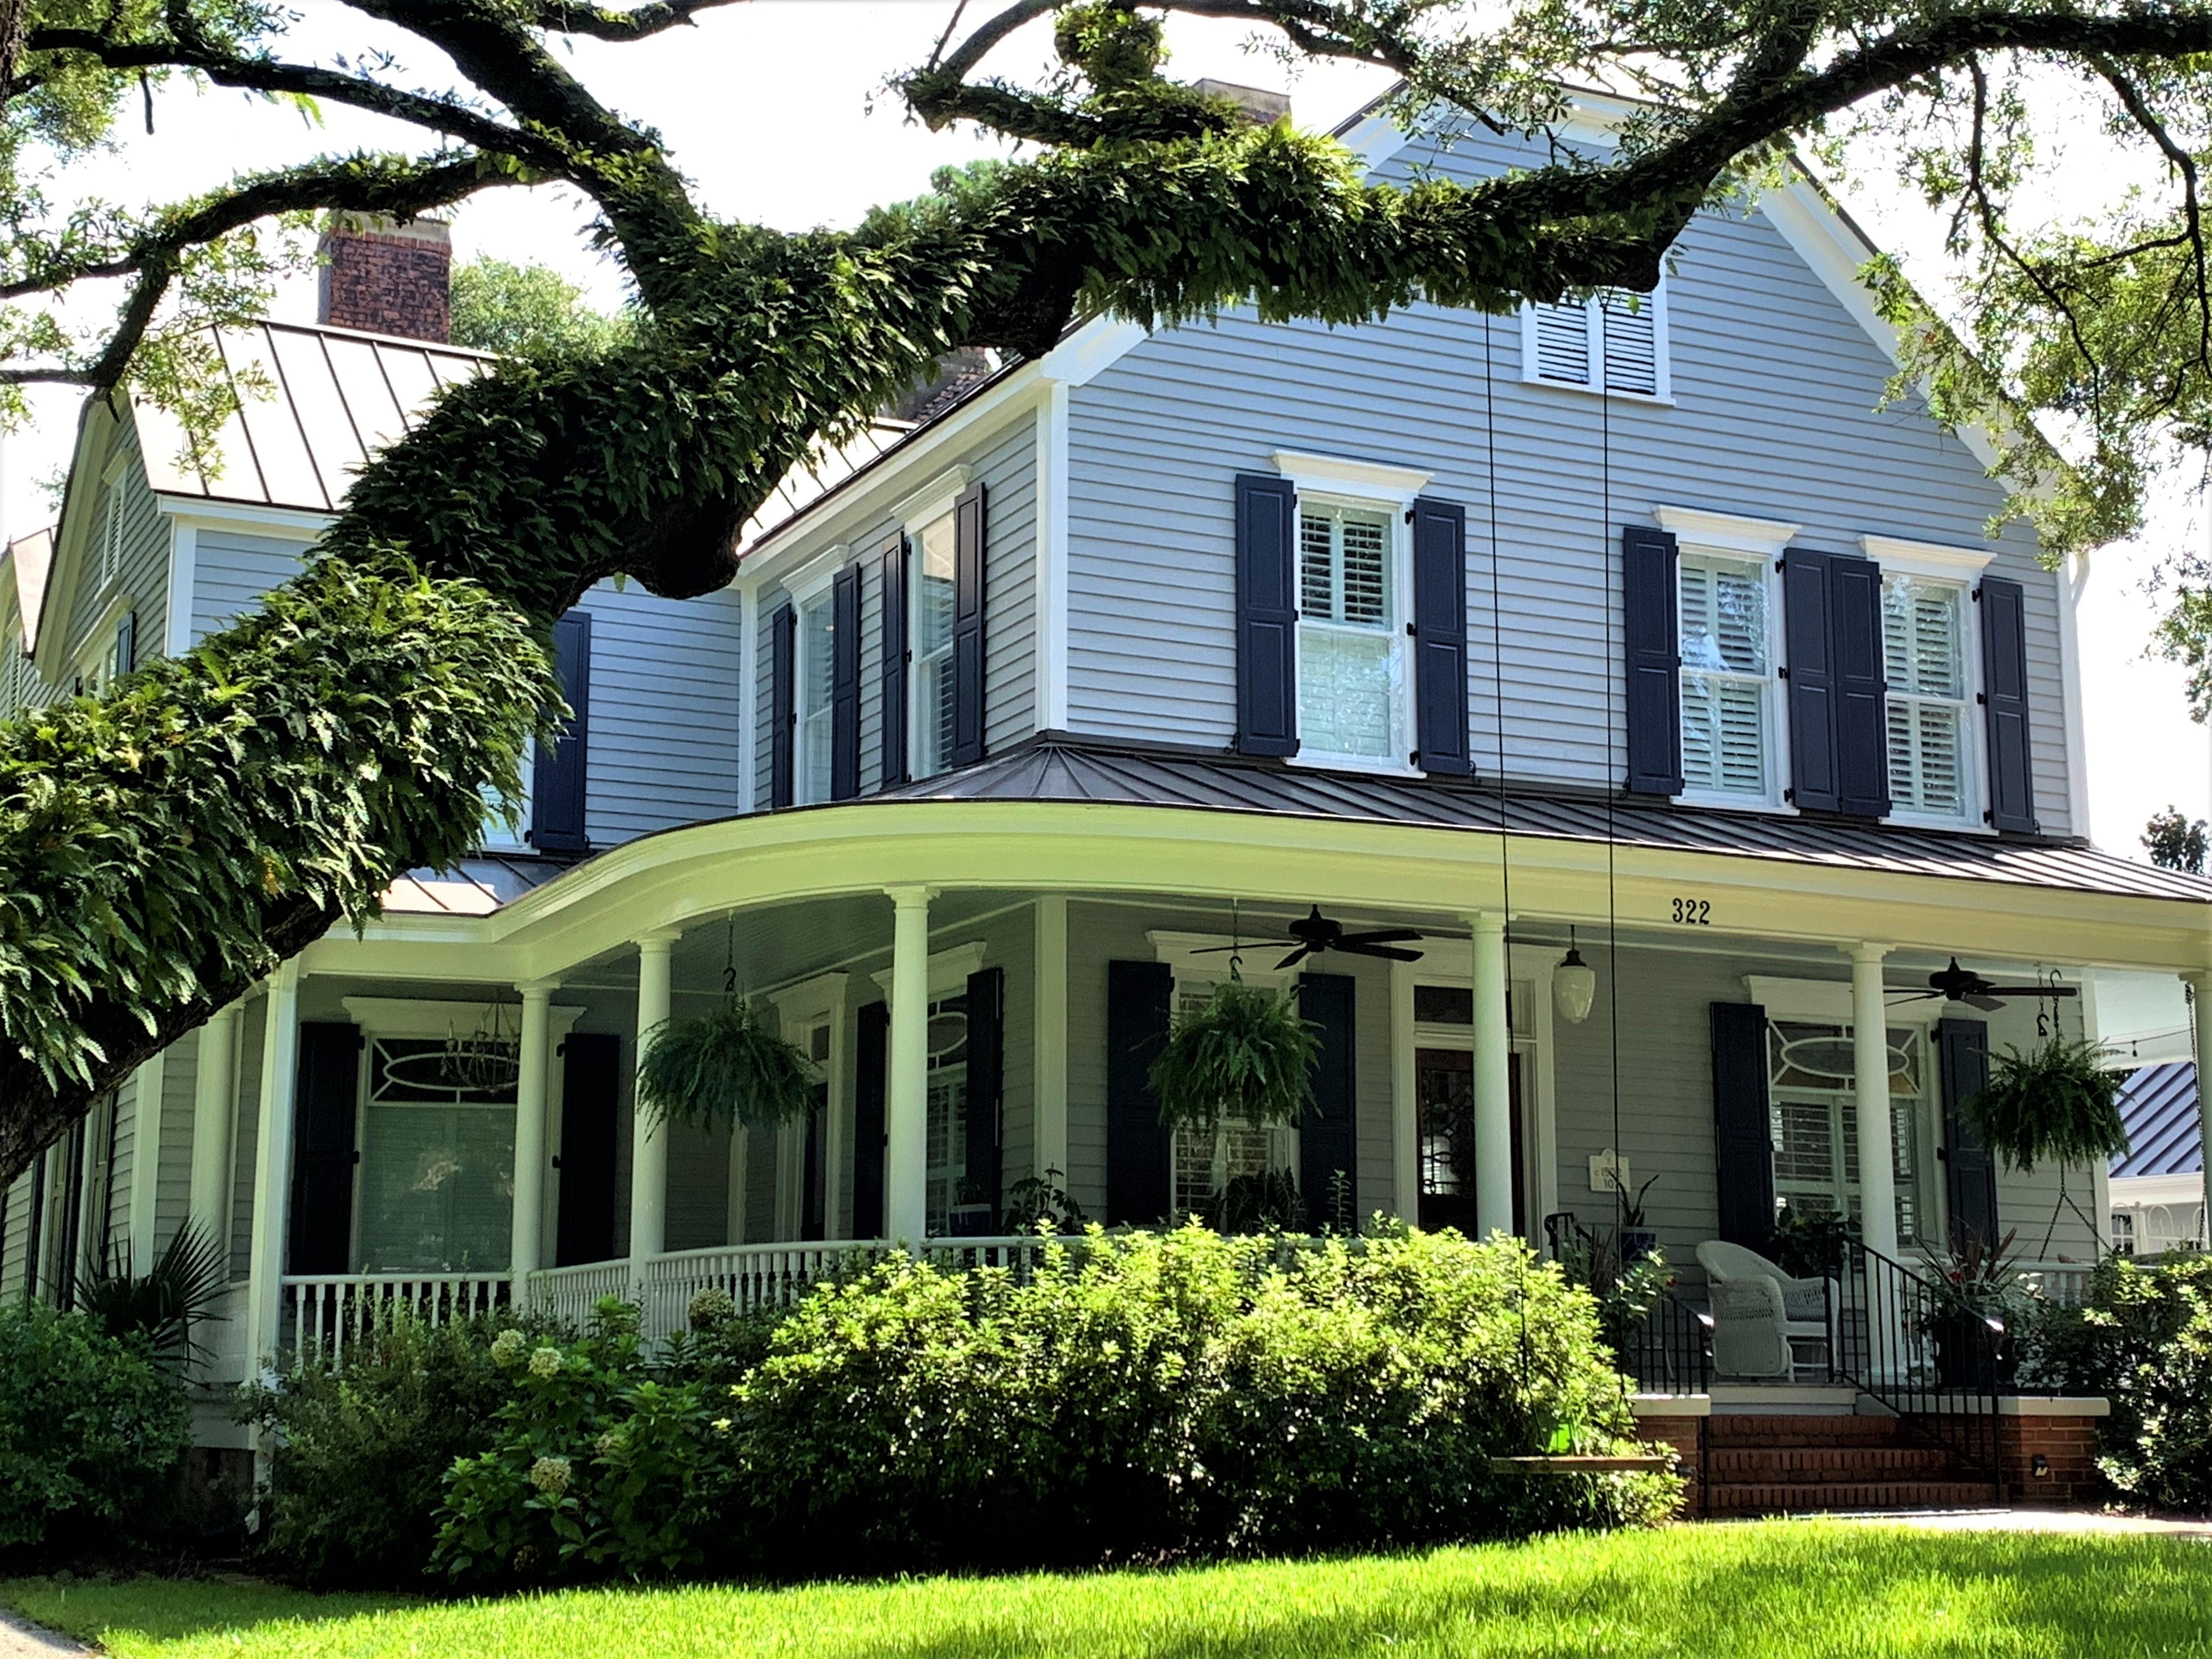 Gray home in Georgetown under live oak tree